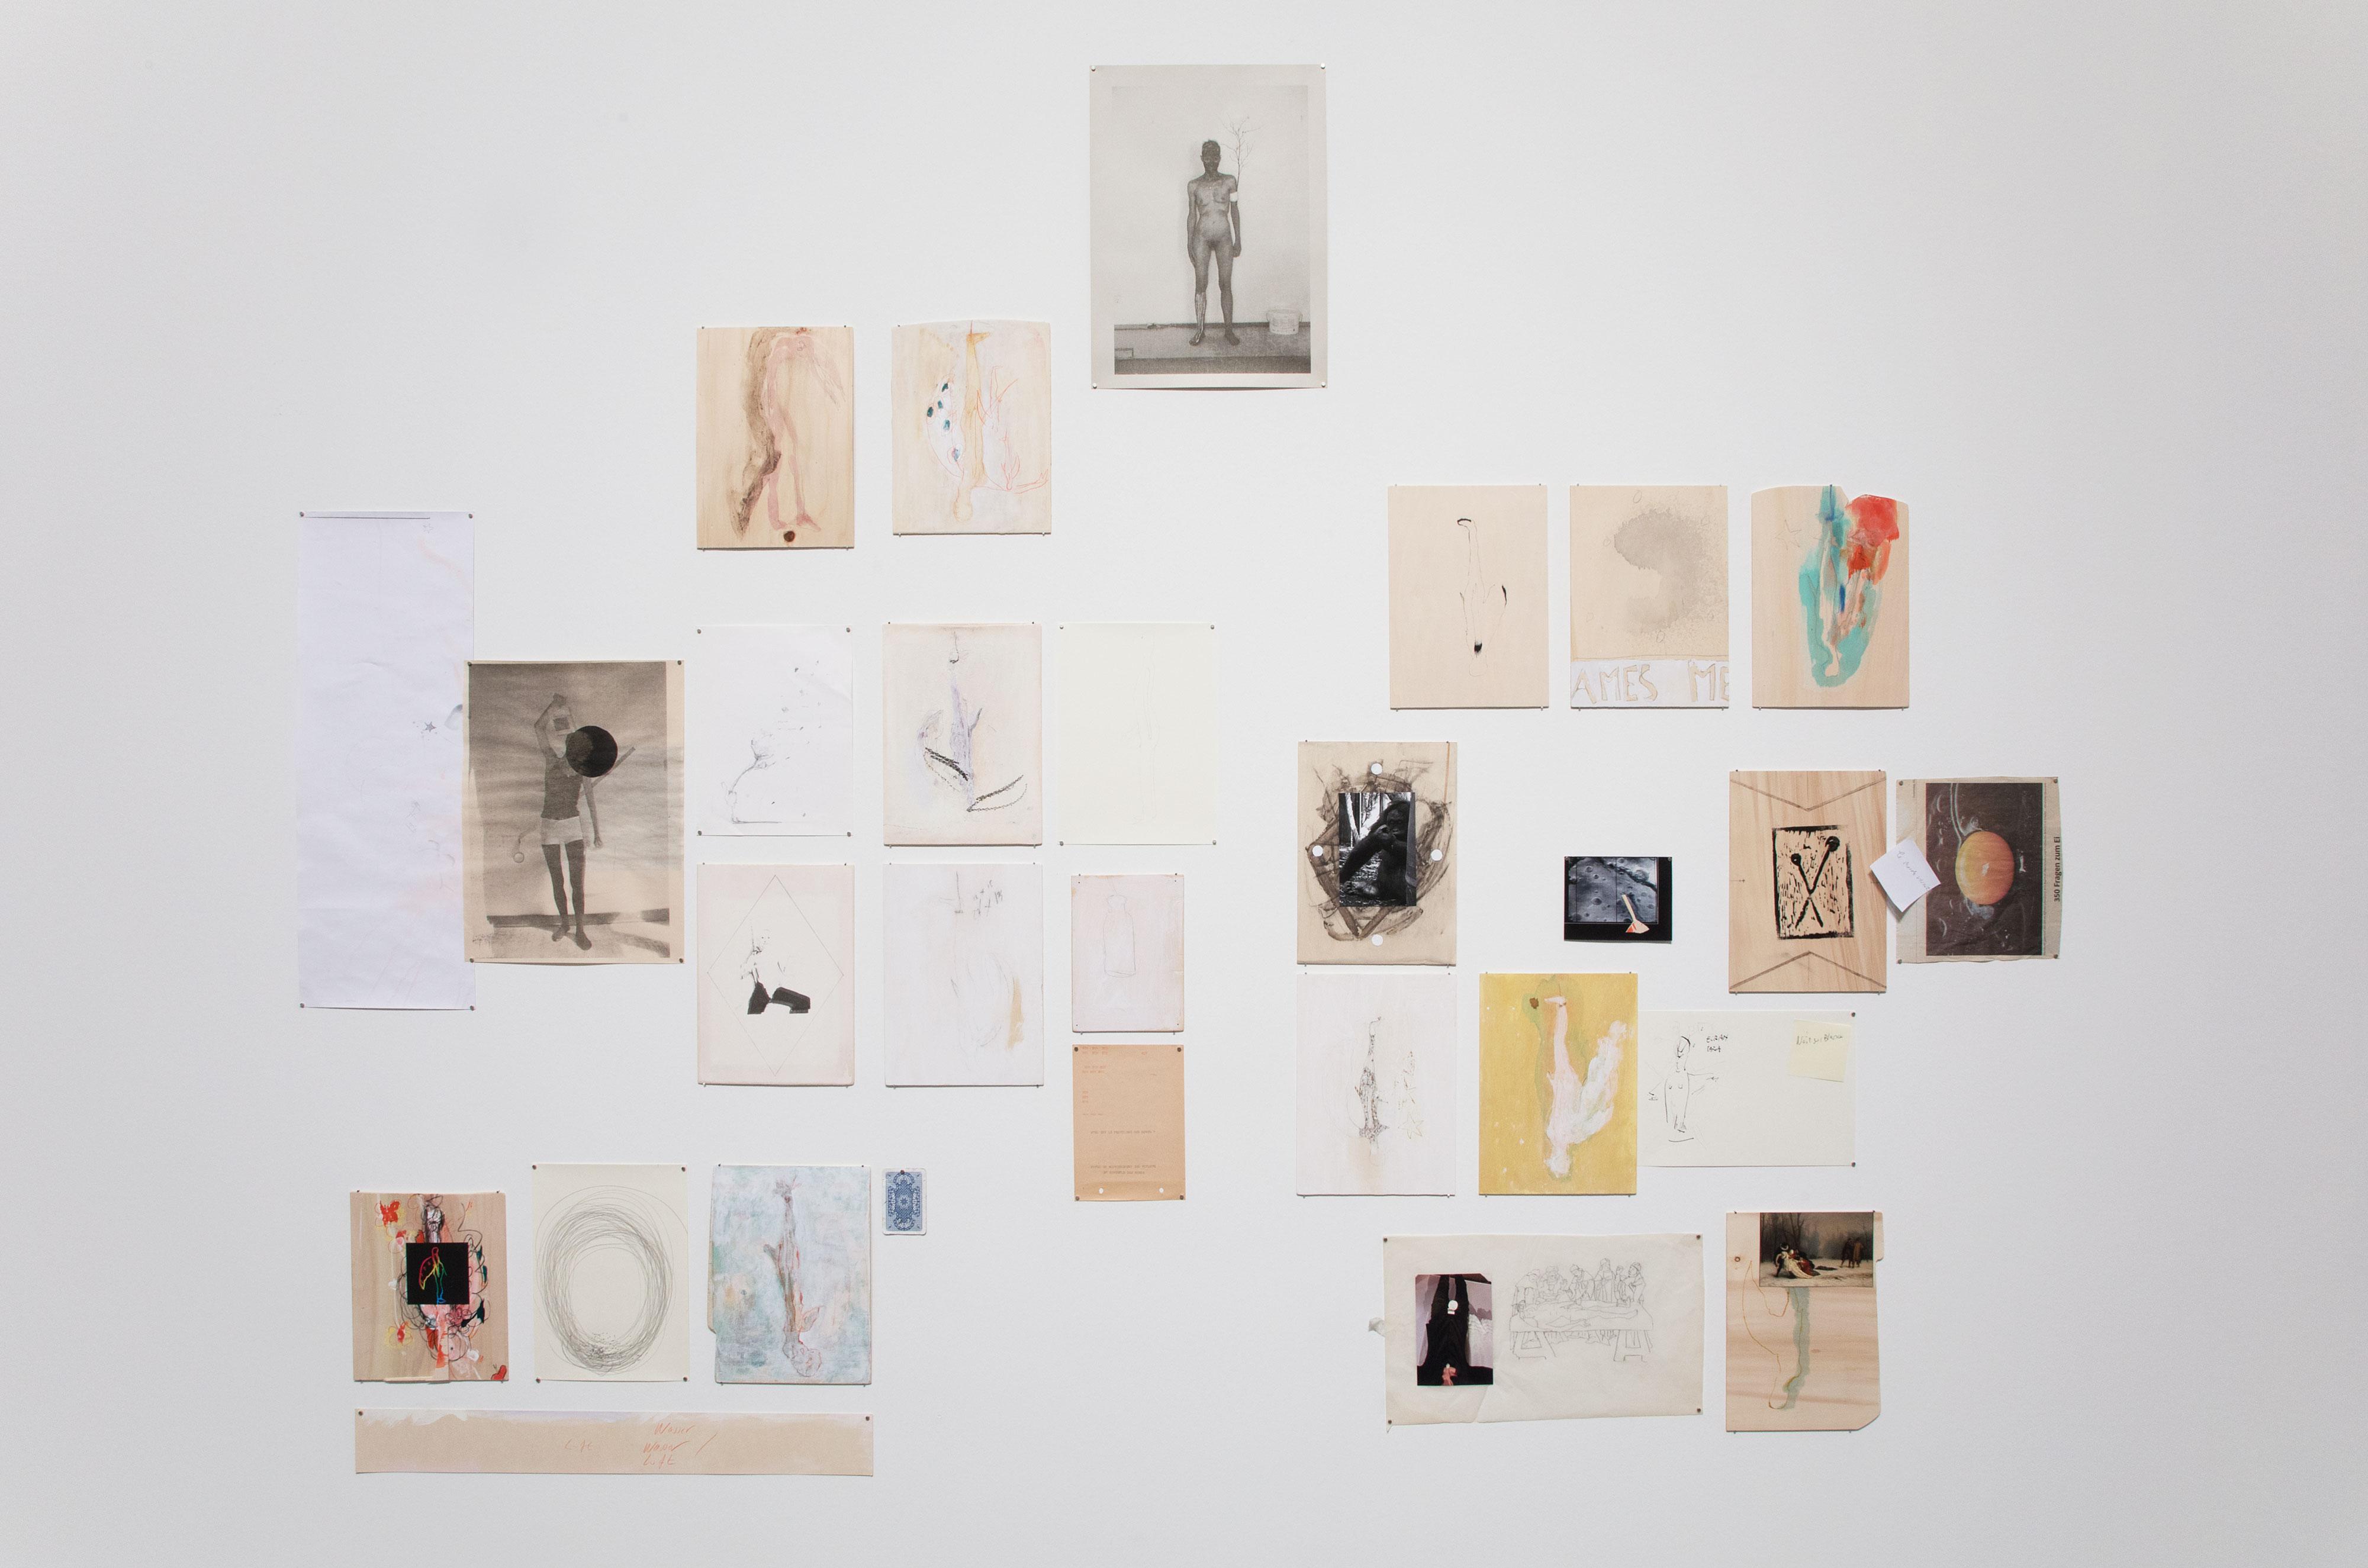 Galerie Barbara Thumm \ Valérie Favre – Haltung & Fall – Die Welt im Taumel